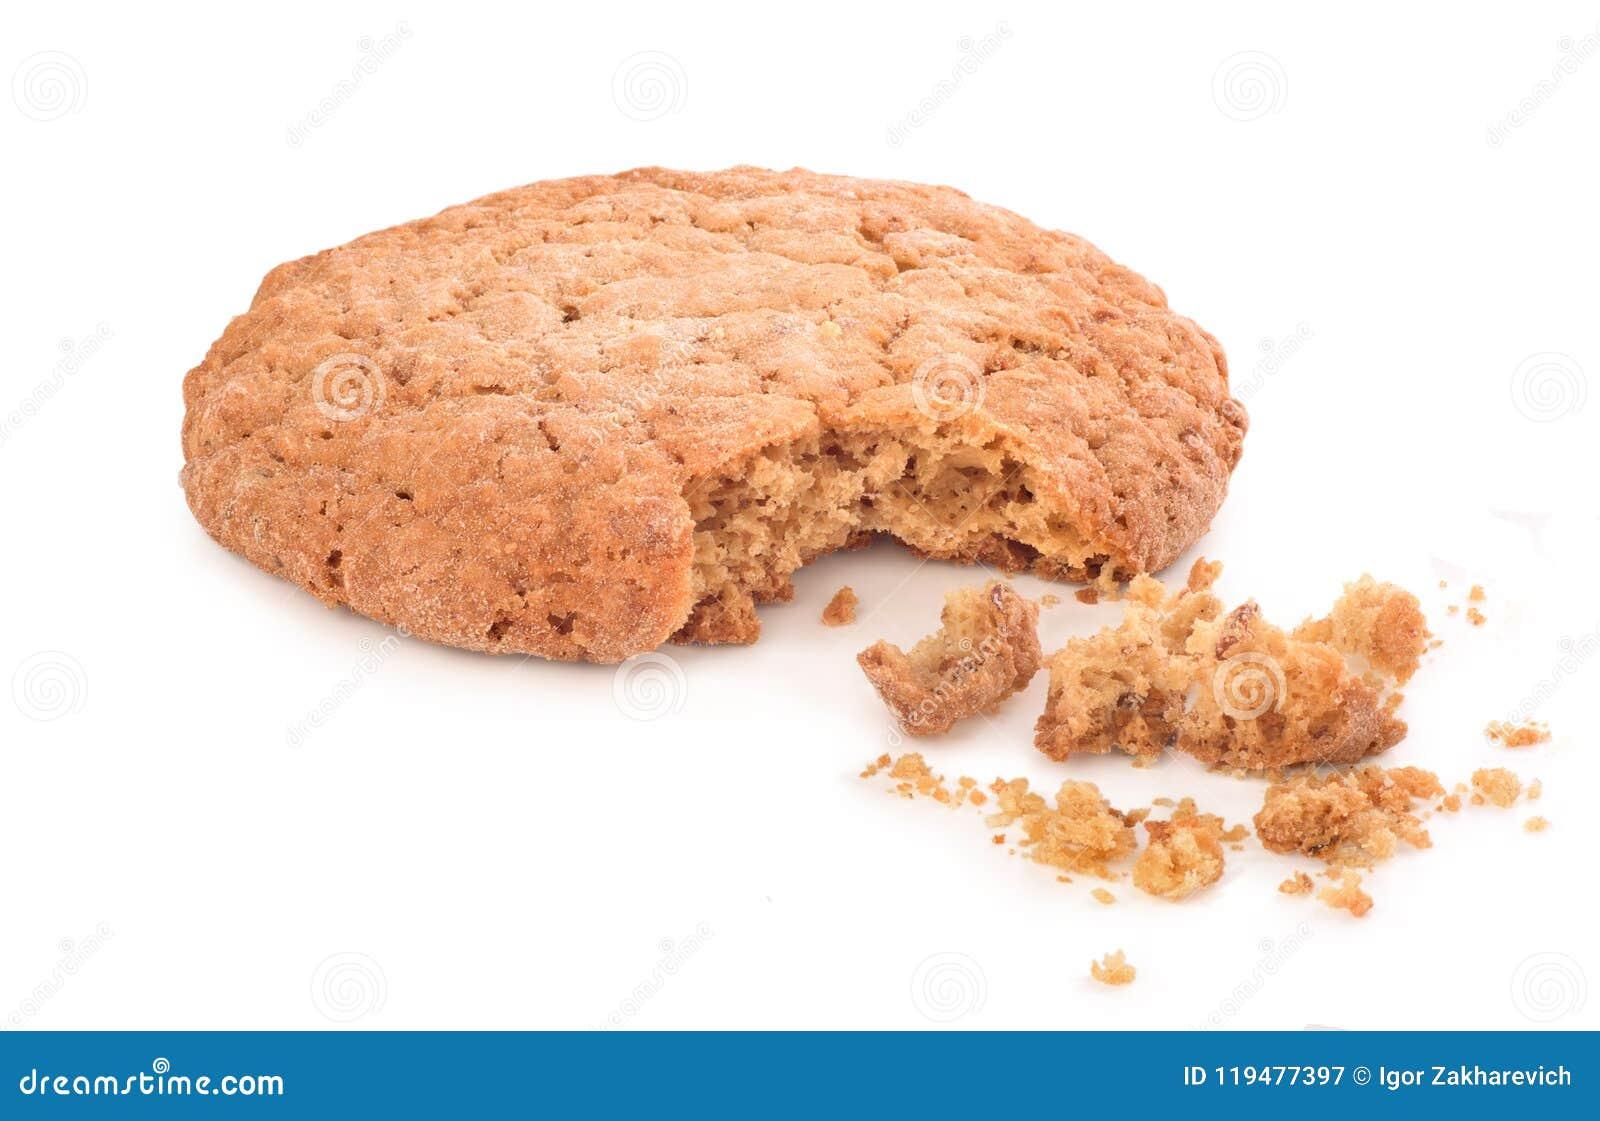 Spruckna kakor på vit bakgrund